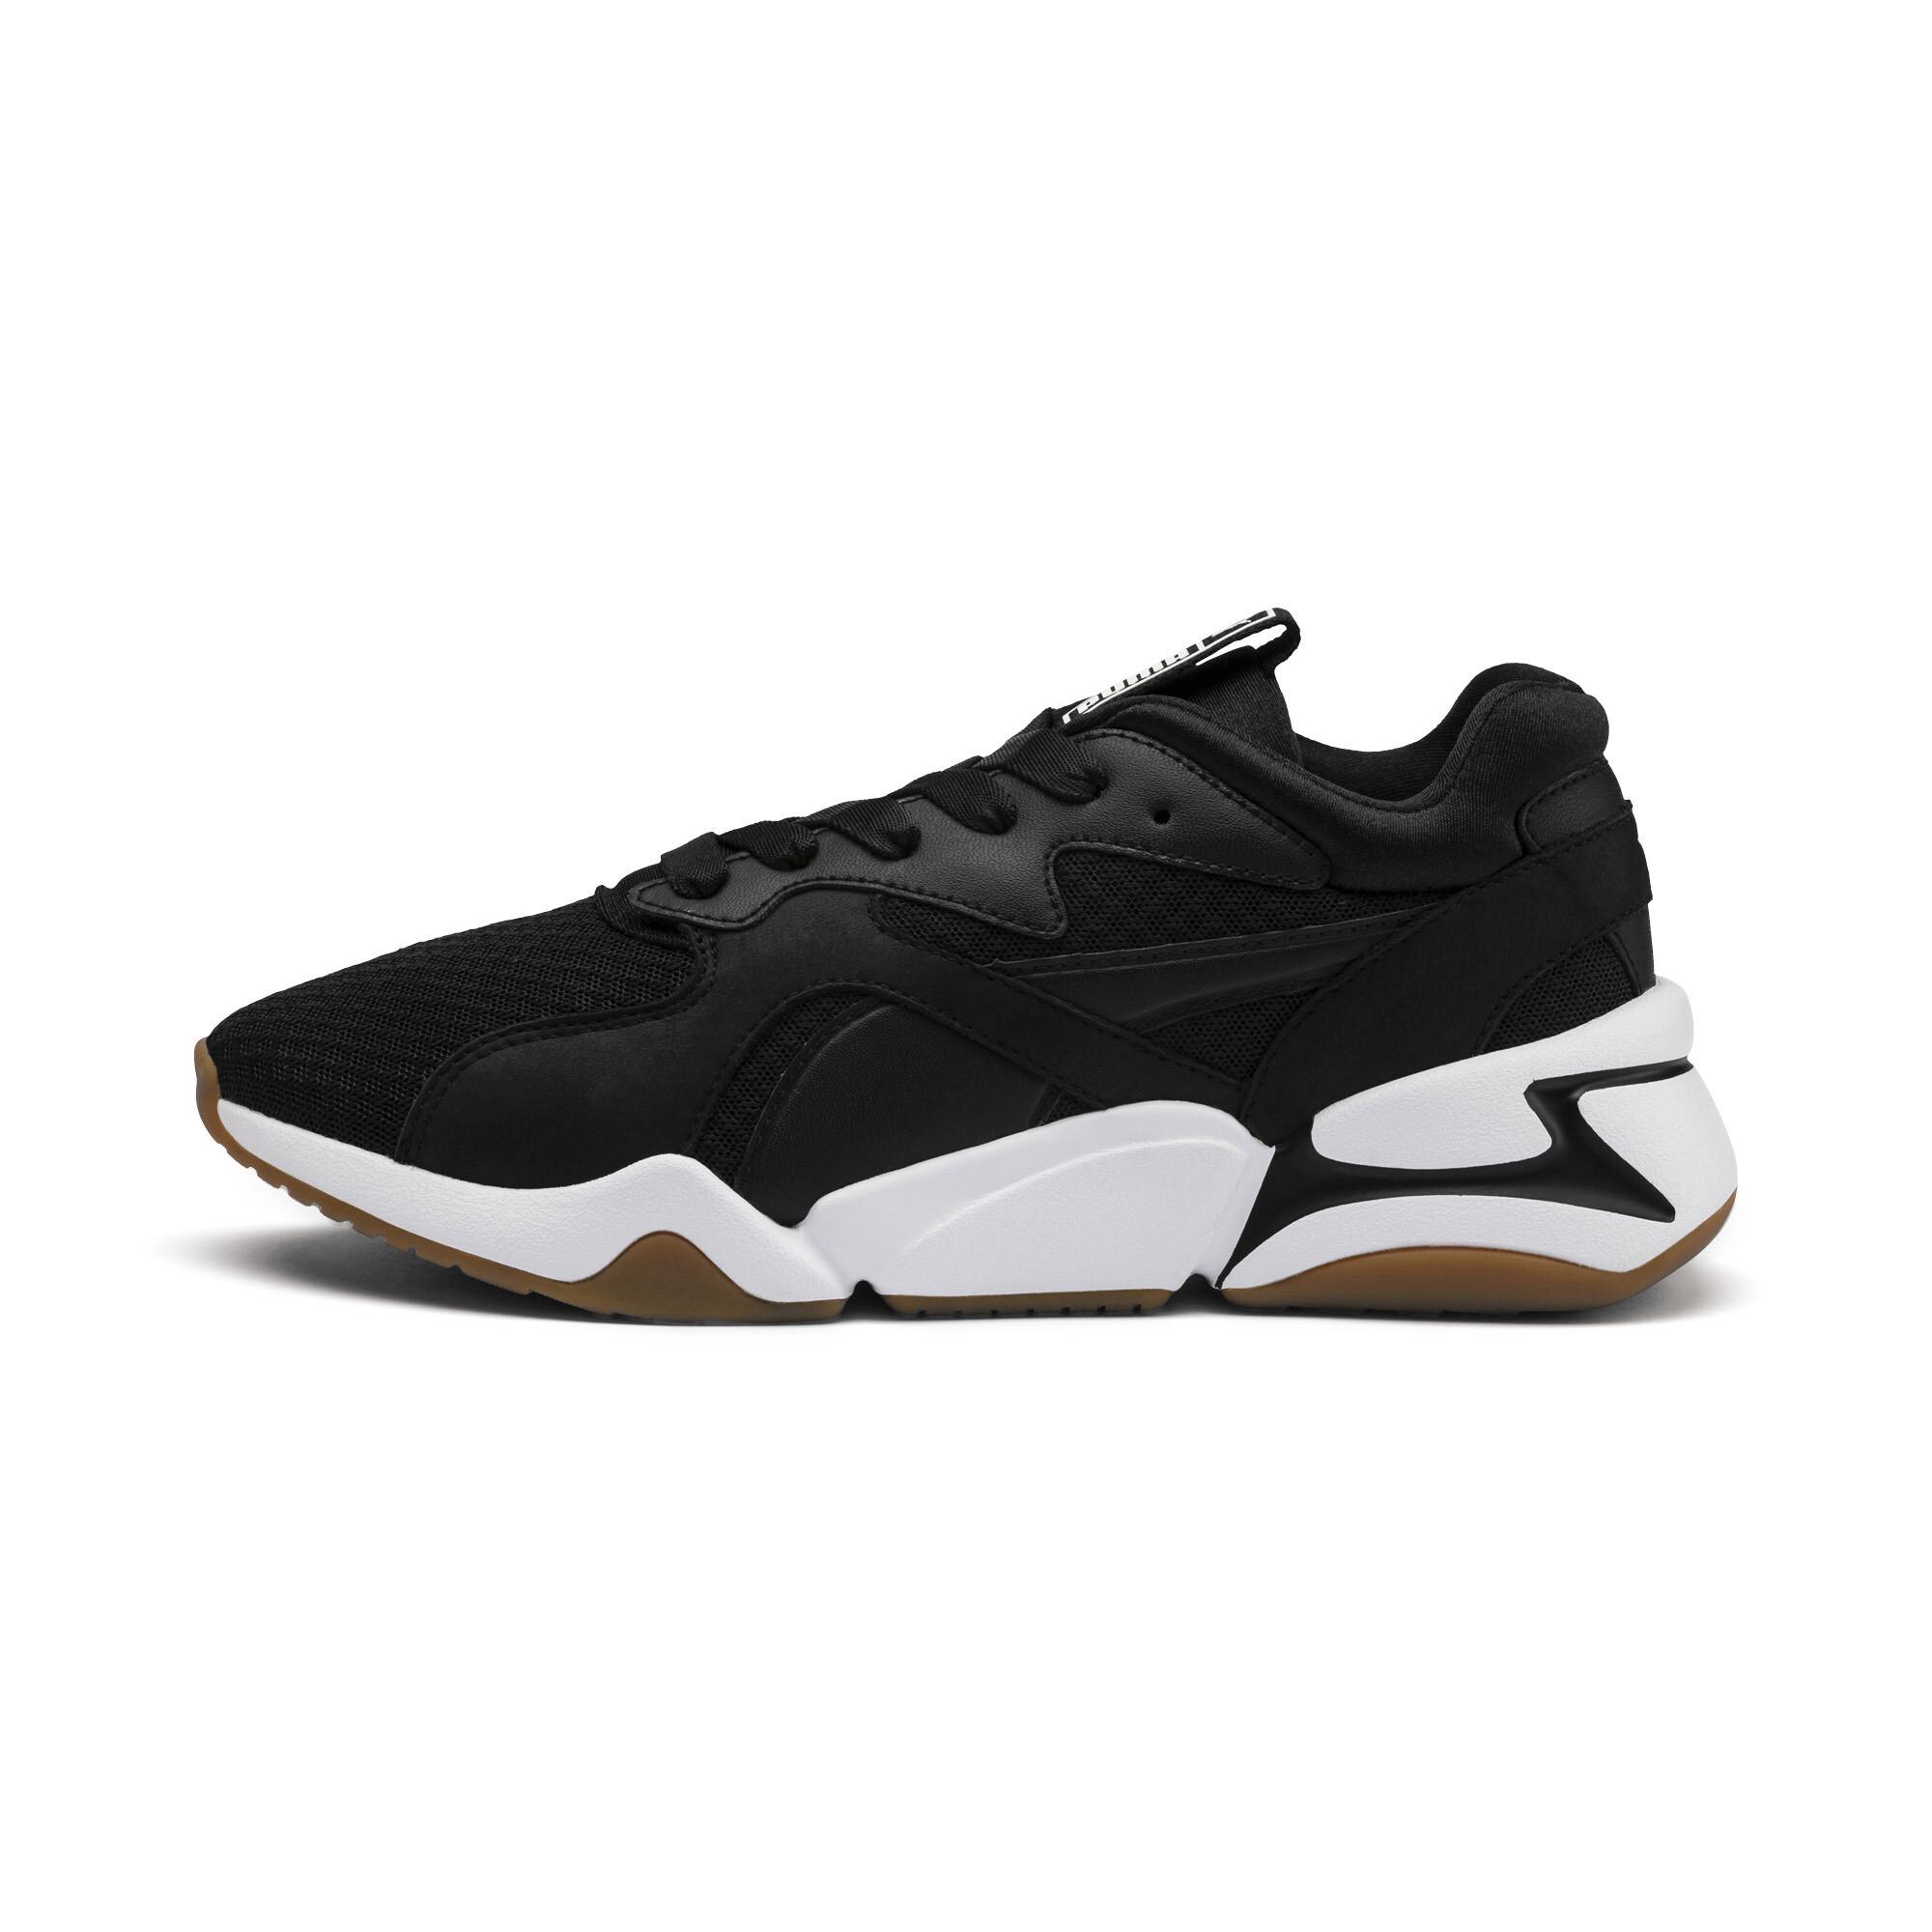 PUMA Muse 2 EOS Trailblazer Women's Sneakers | Active Athlete 88